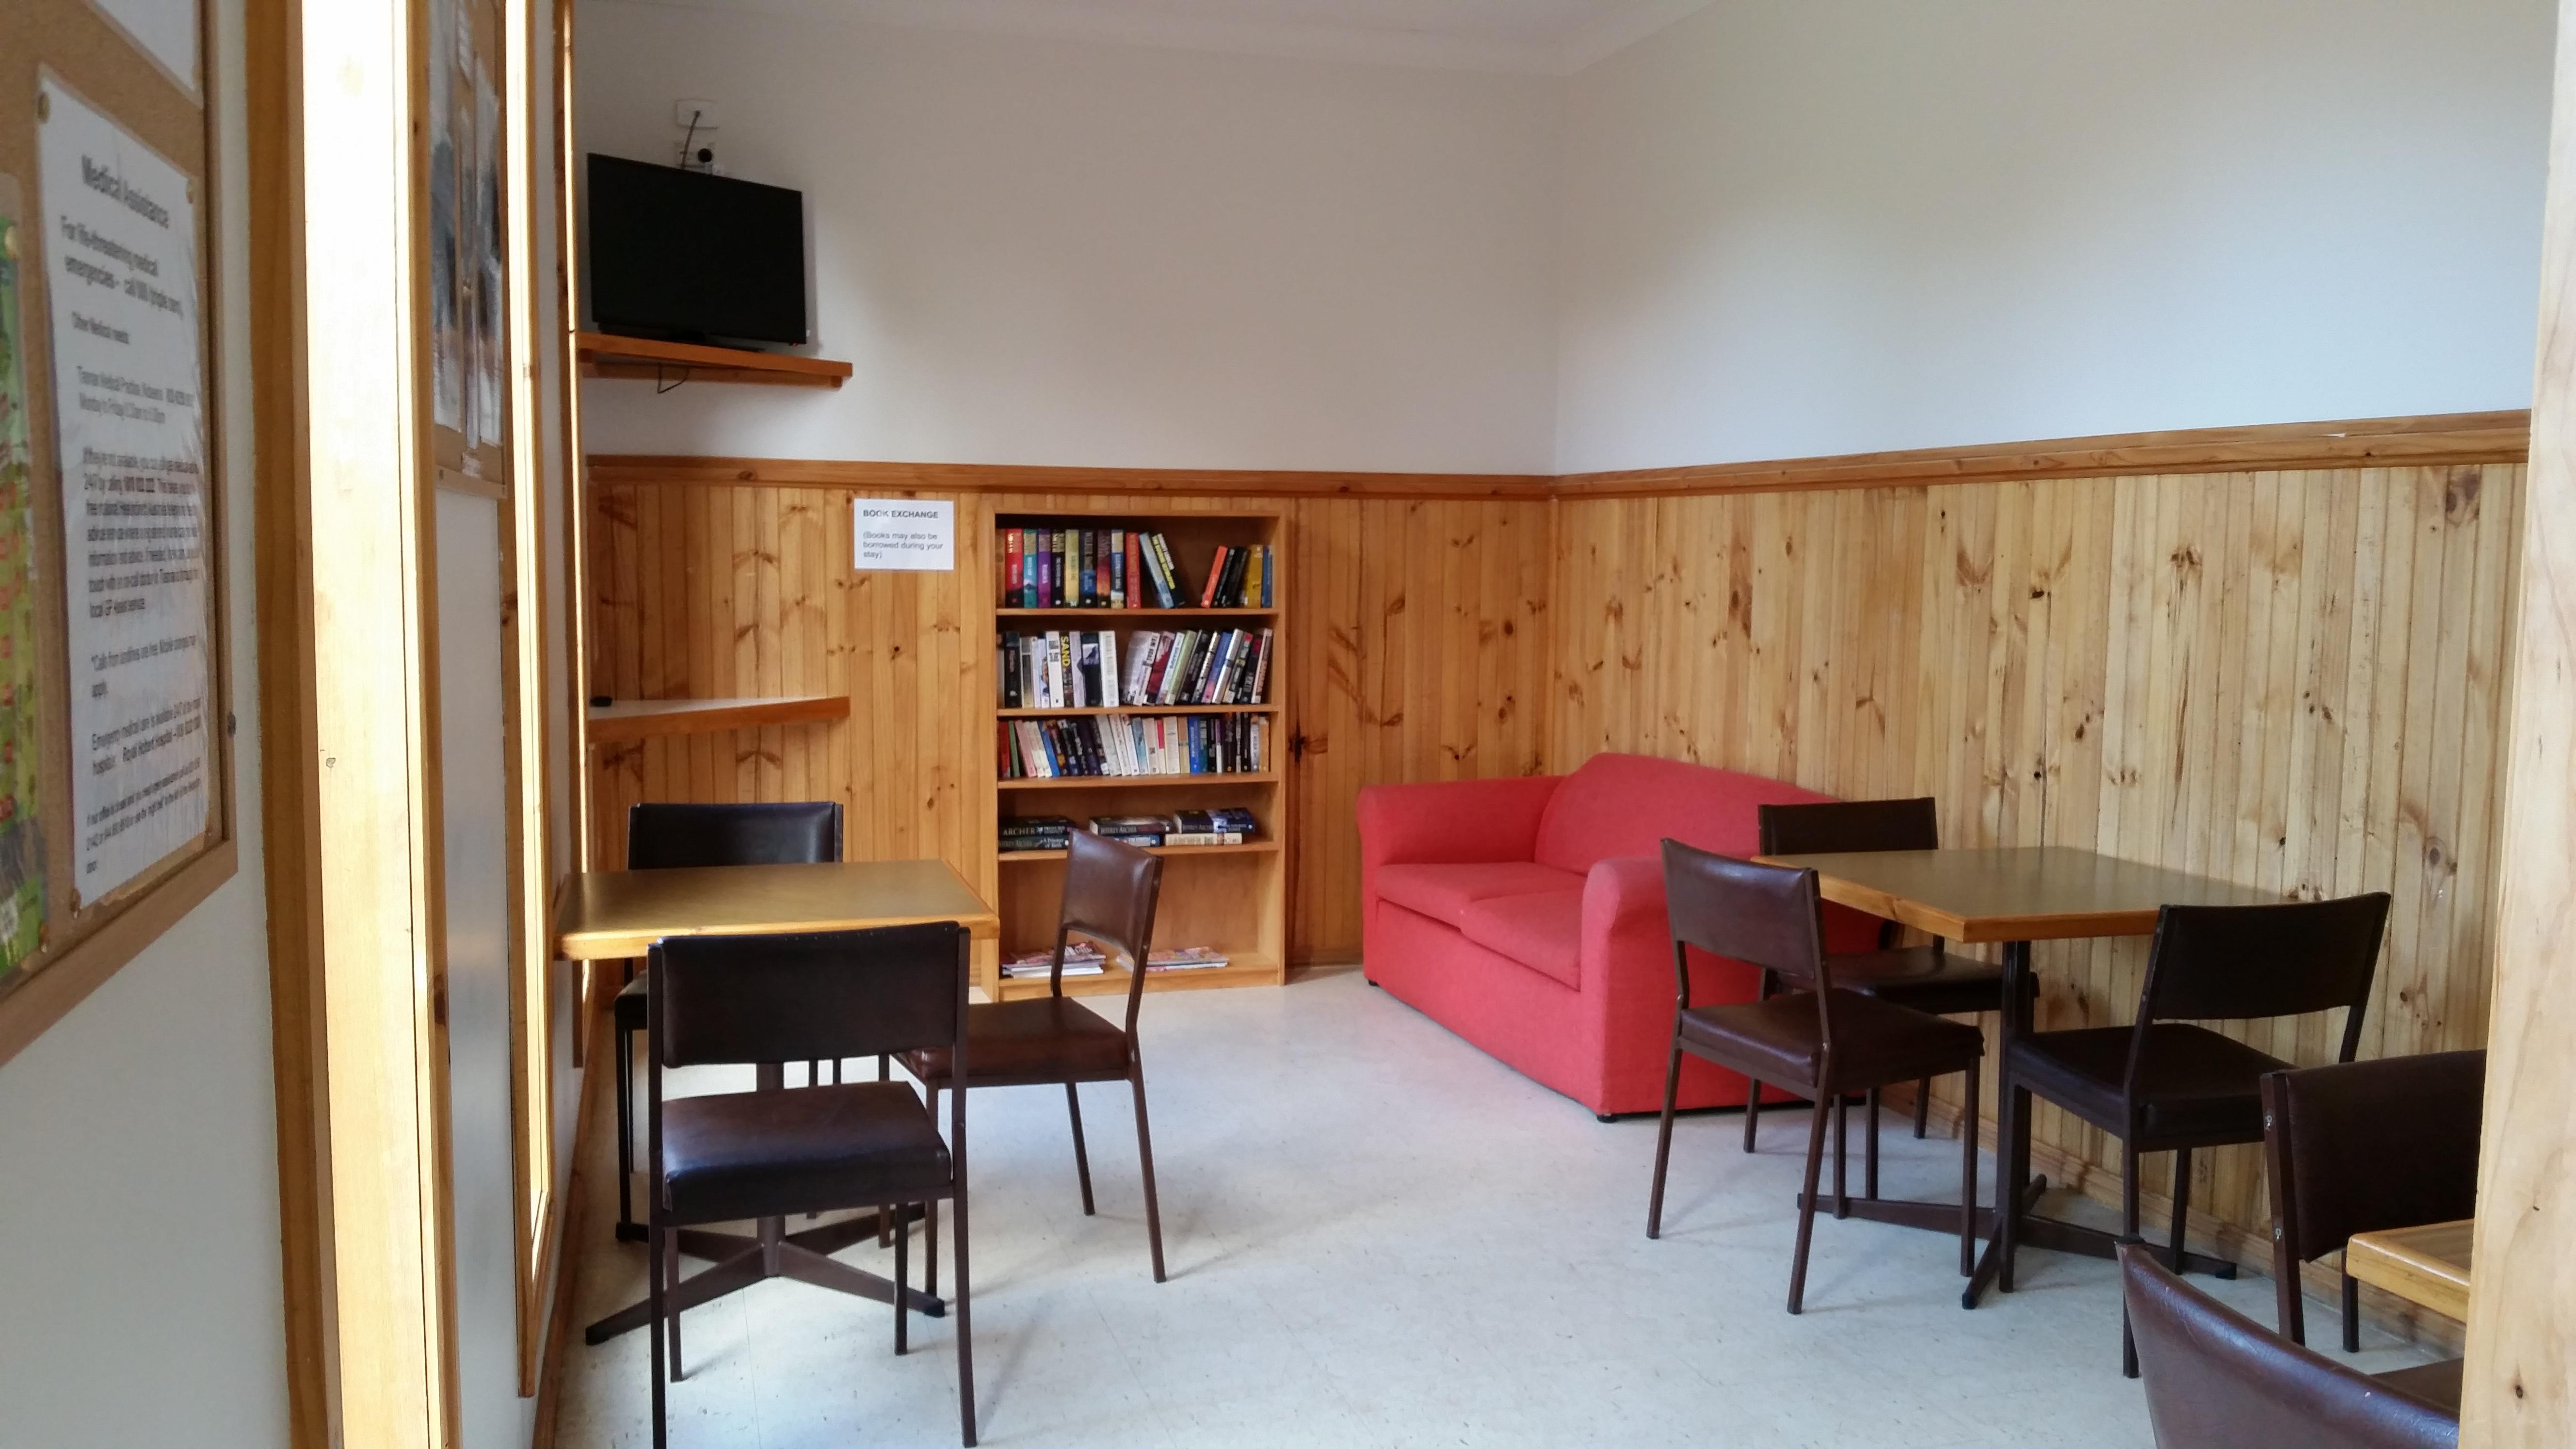 Camp dining room